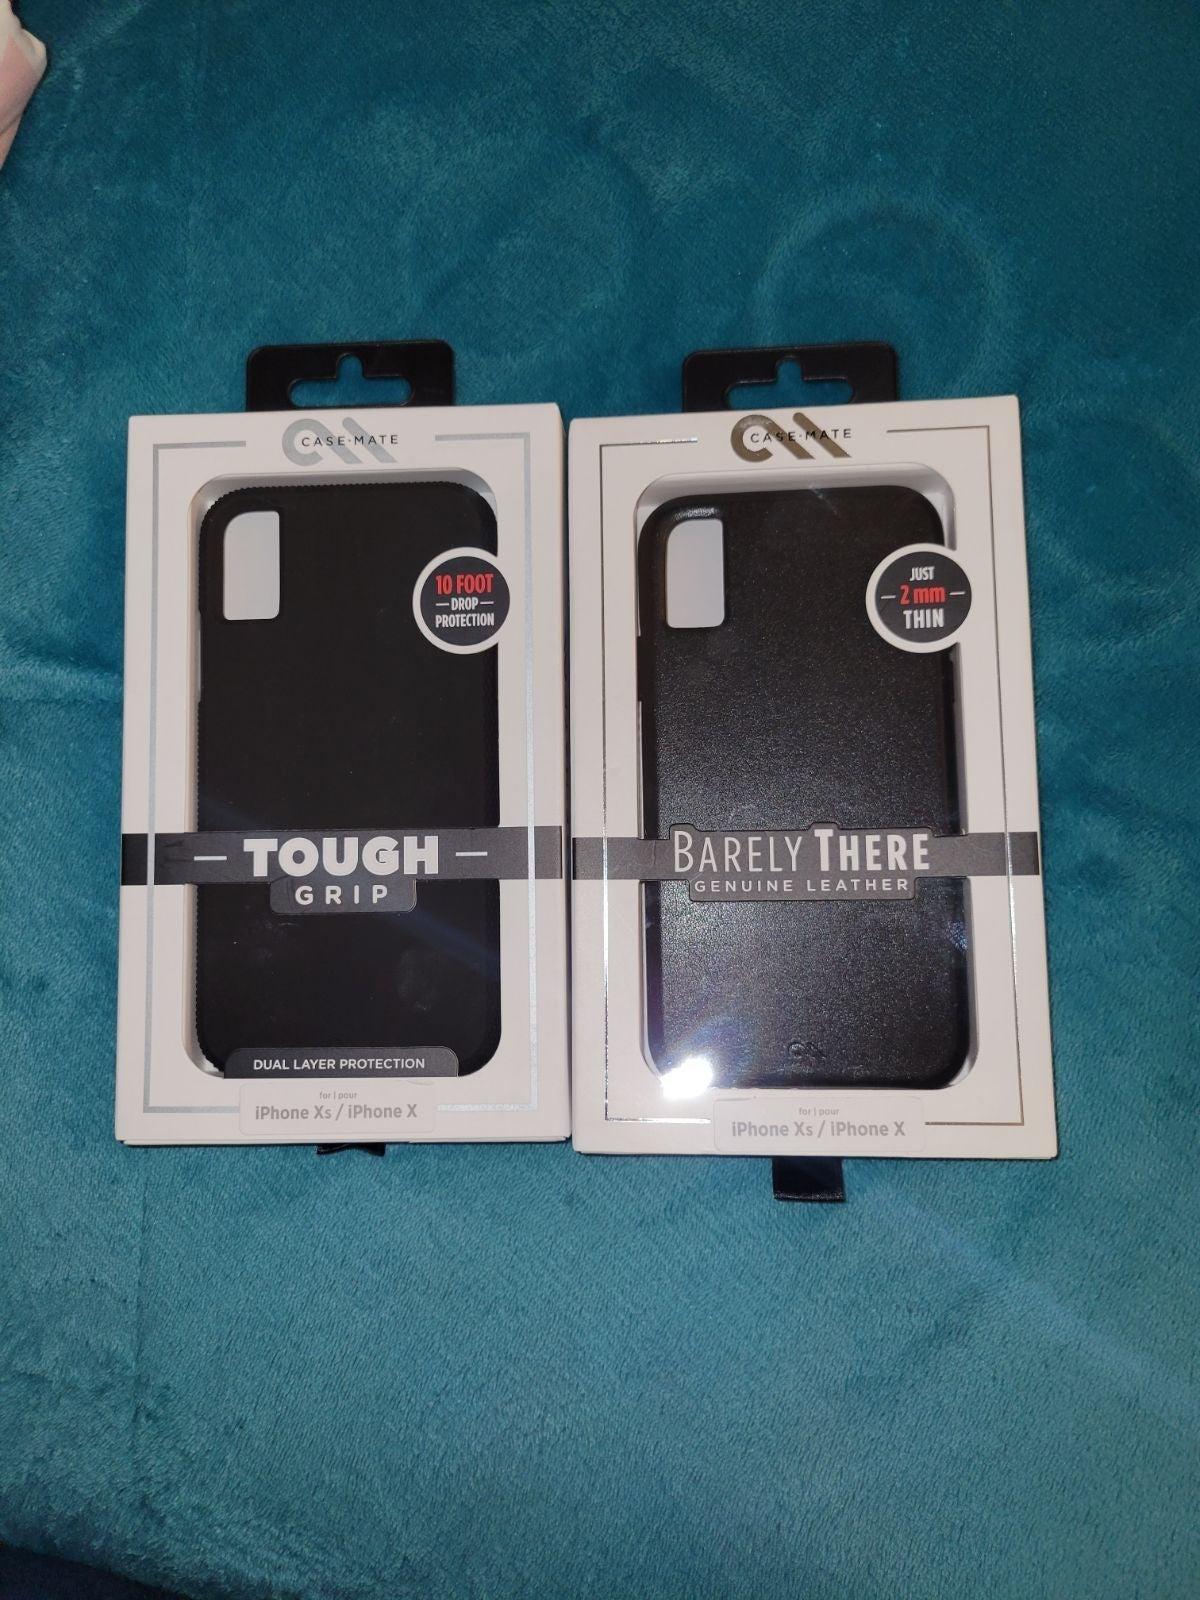 2 Iphone Xs/ X phone cases